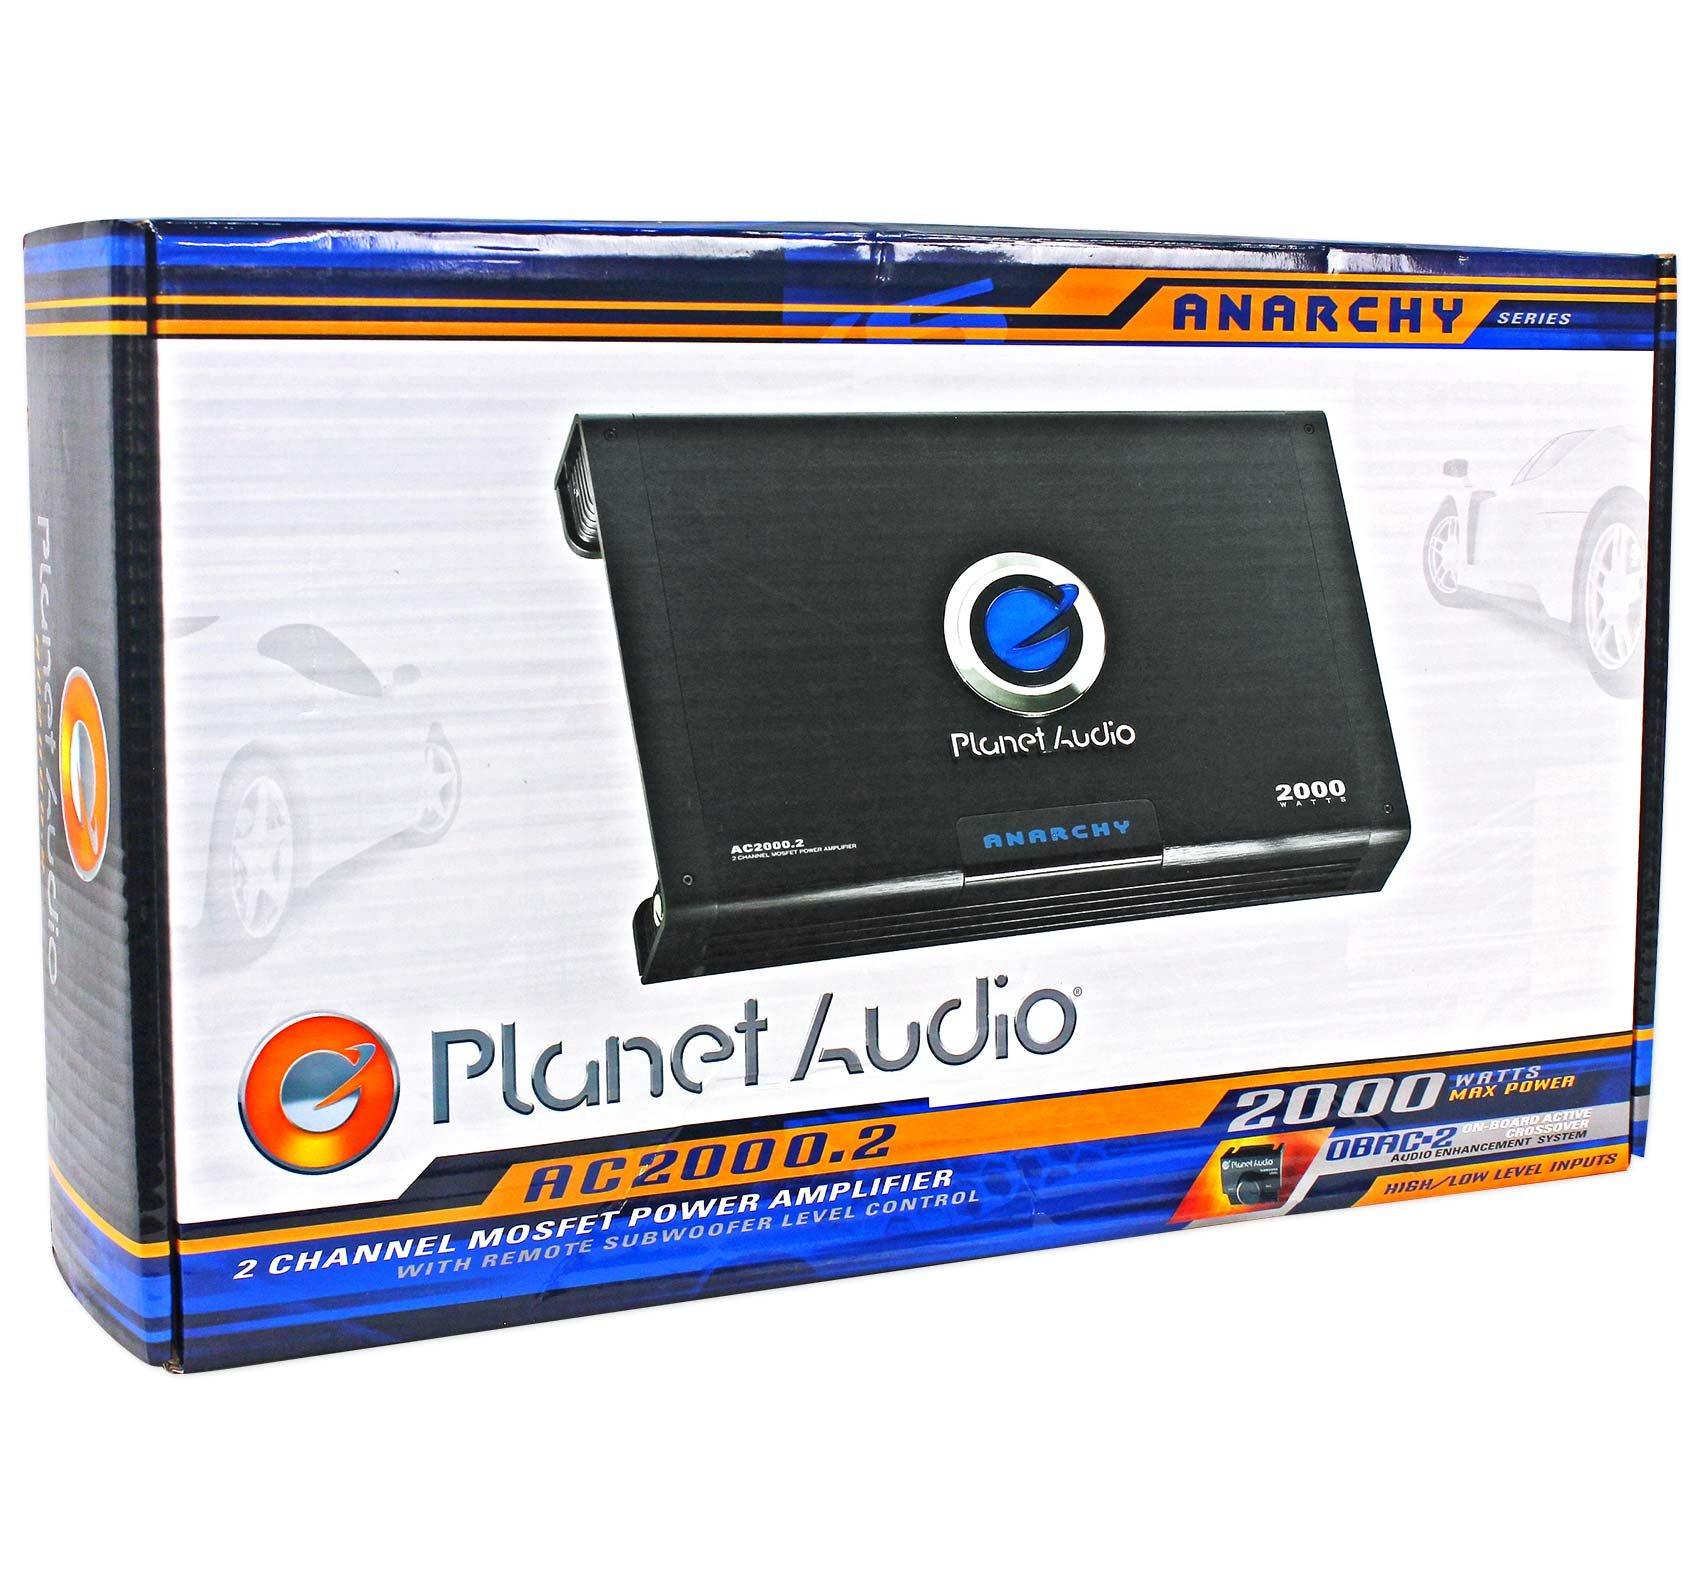 Remote New Planet Audio Anarchy AC2000.2 2000 Watt 2 Channel Car Amplifier Amp